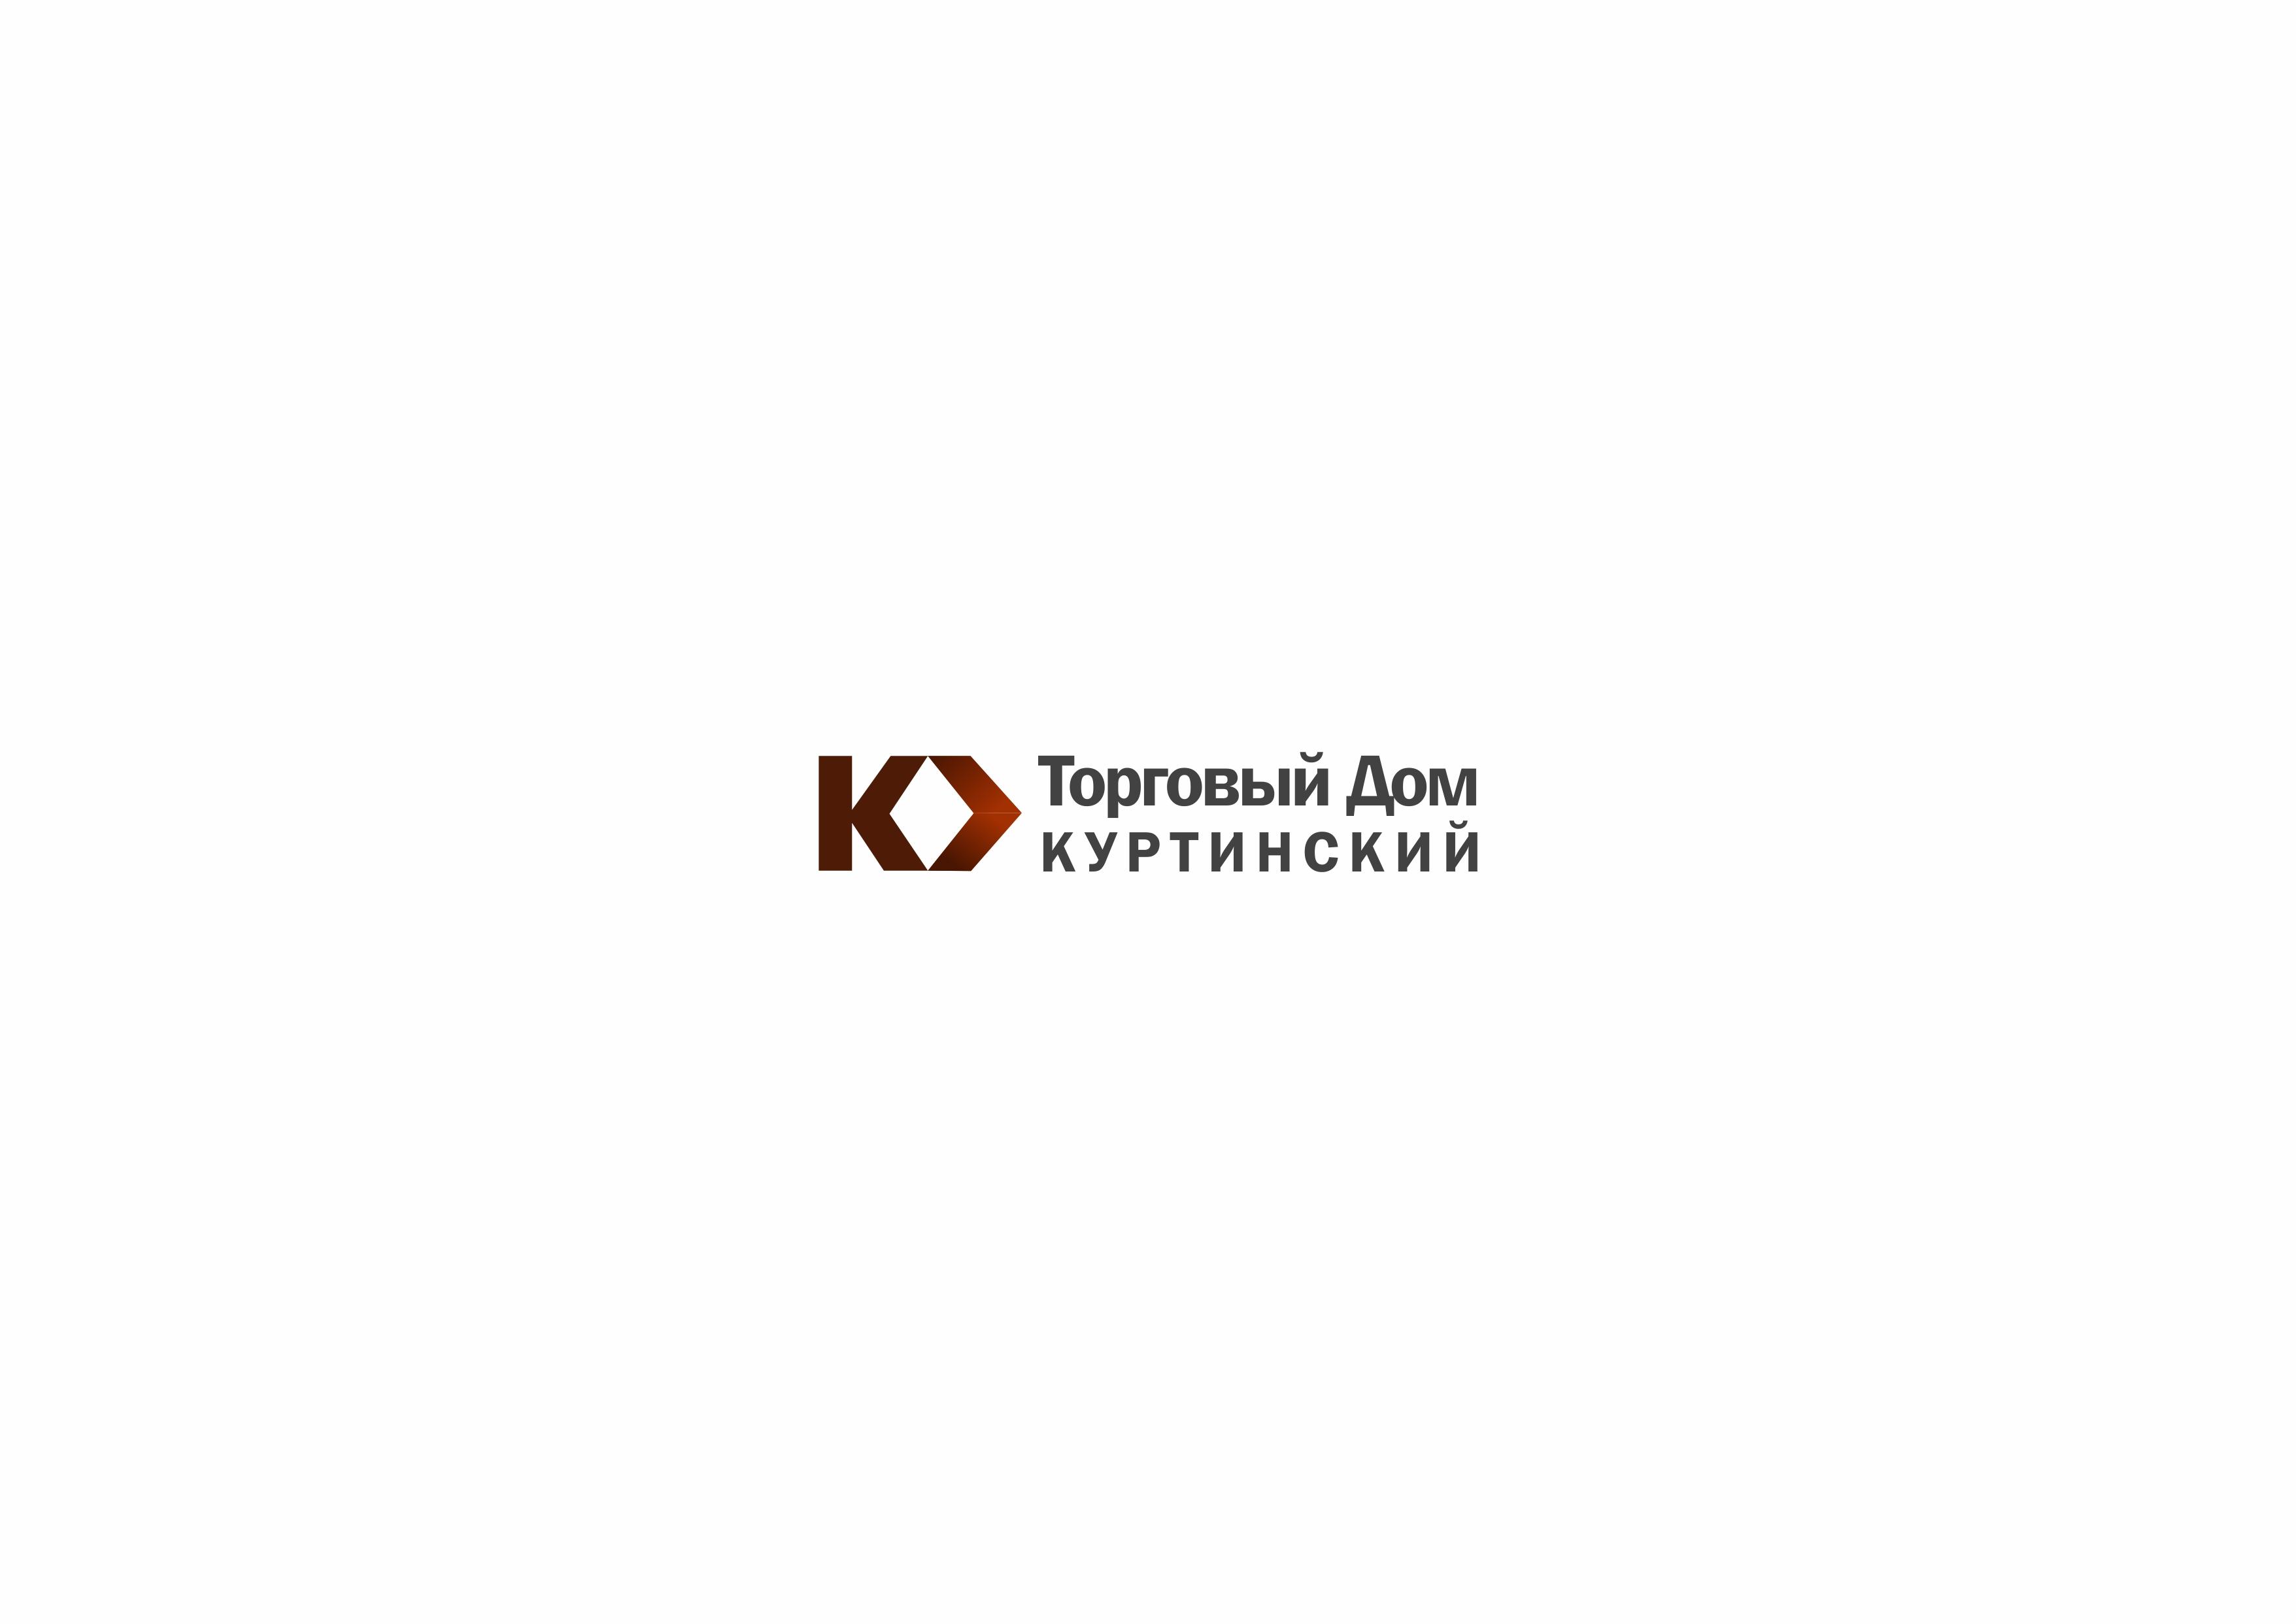 Логотип для камнедобывающей компании фото f_8915b98d1109f848.jpg